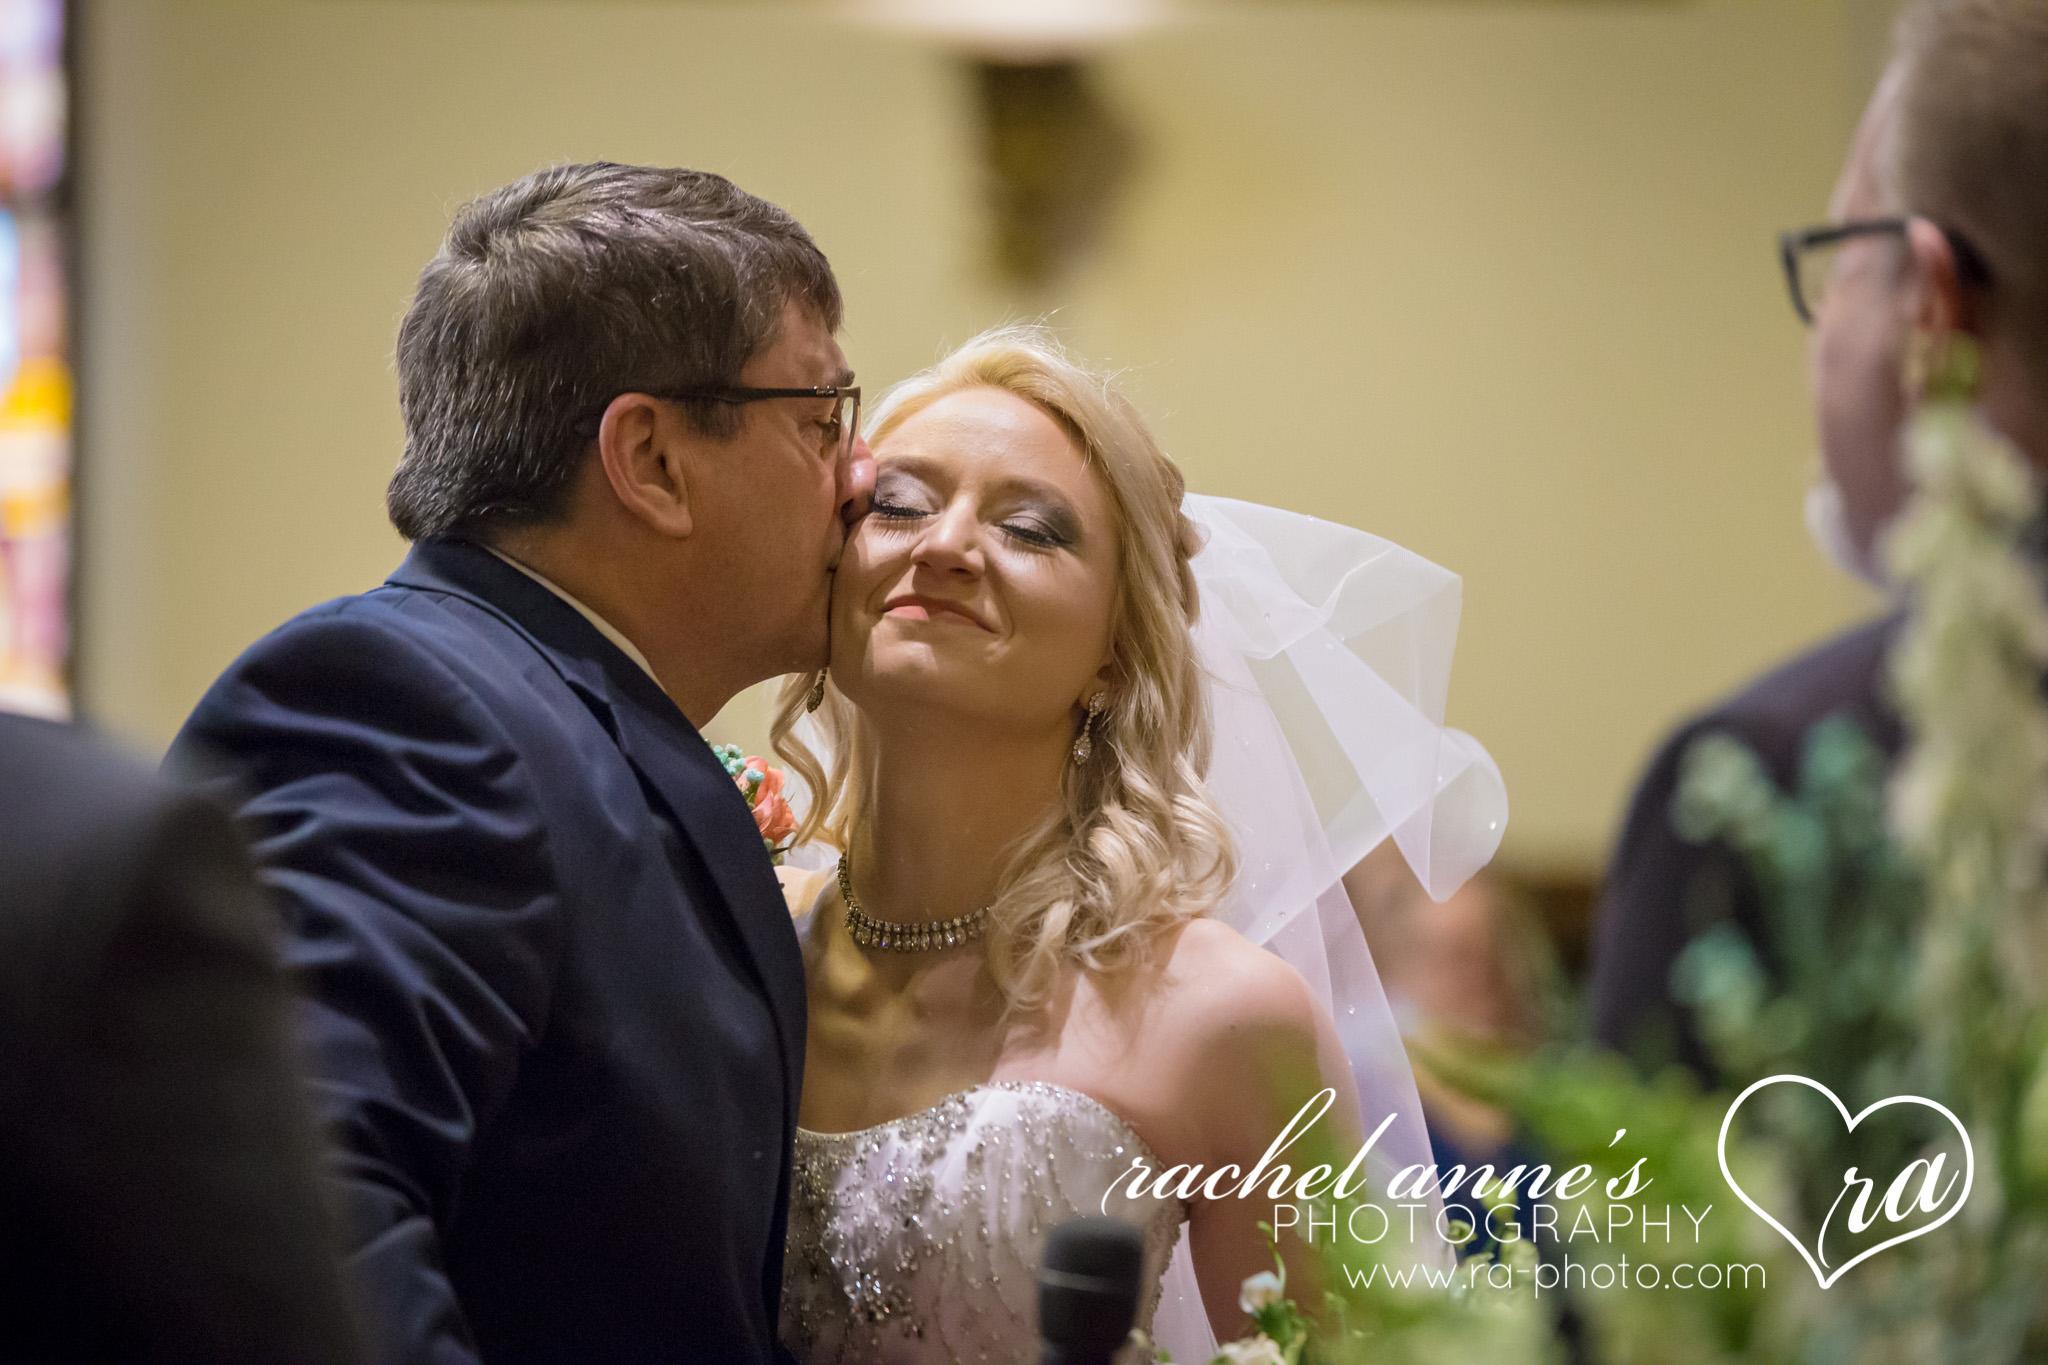 021-JKS-WEDDINGS-THE-FRANKLIN-PA.jpg